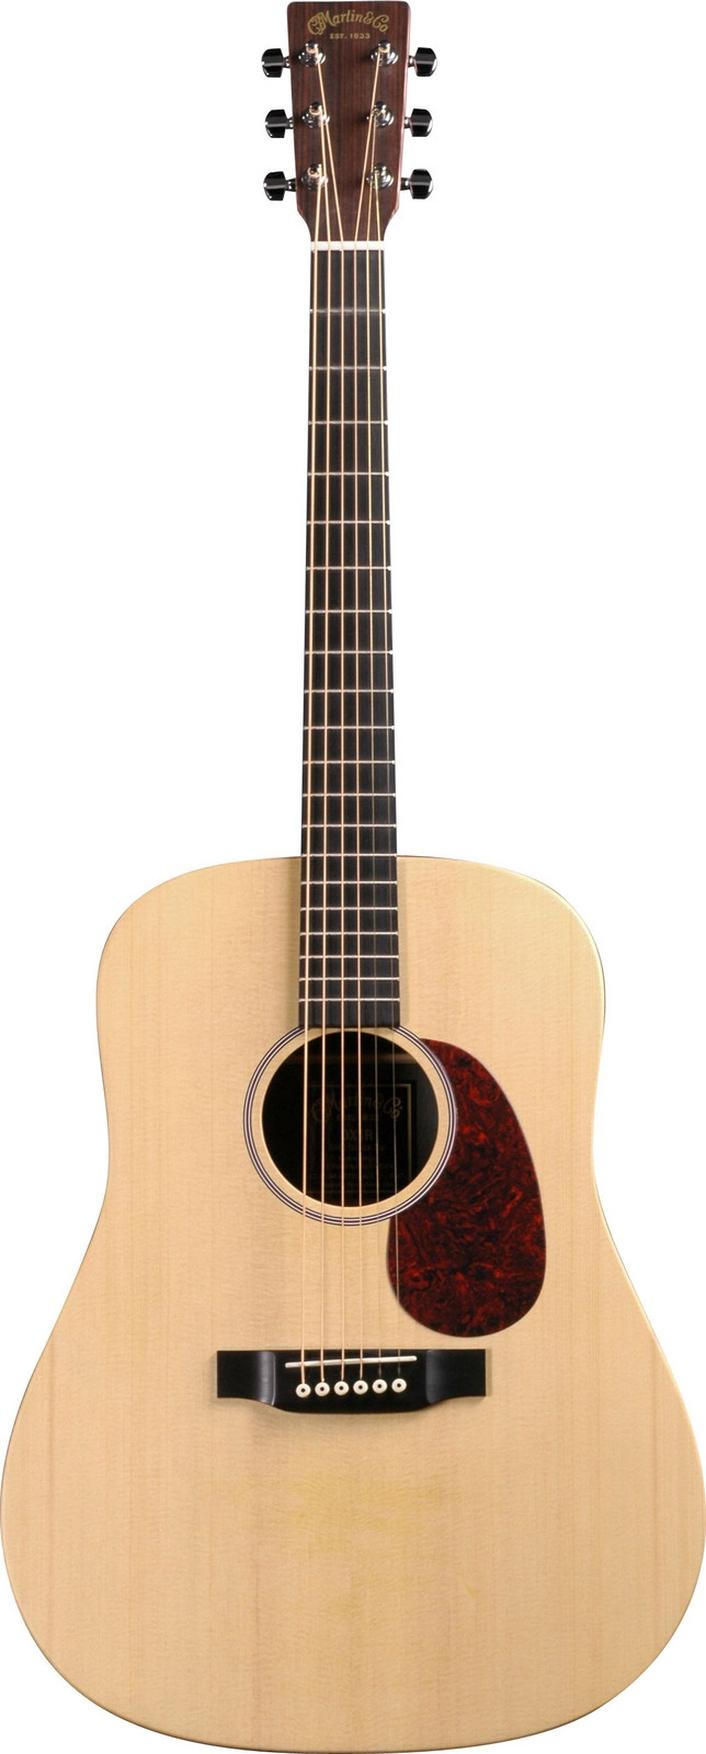 Loves: craft of the guitar-maker